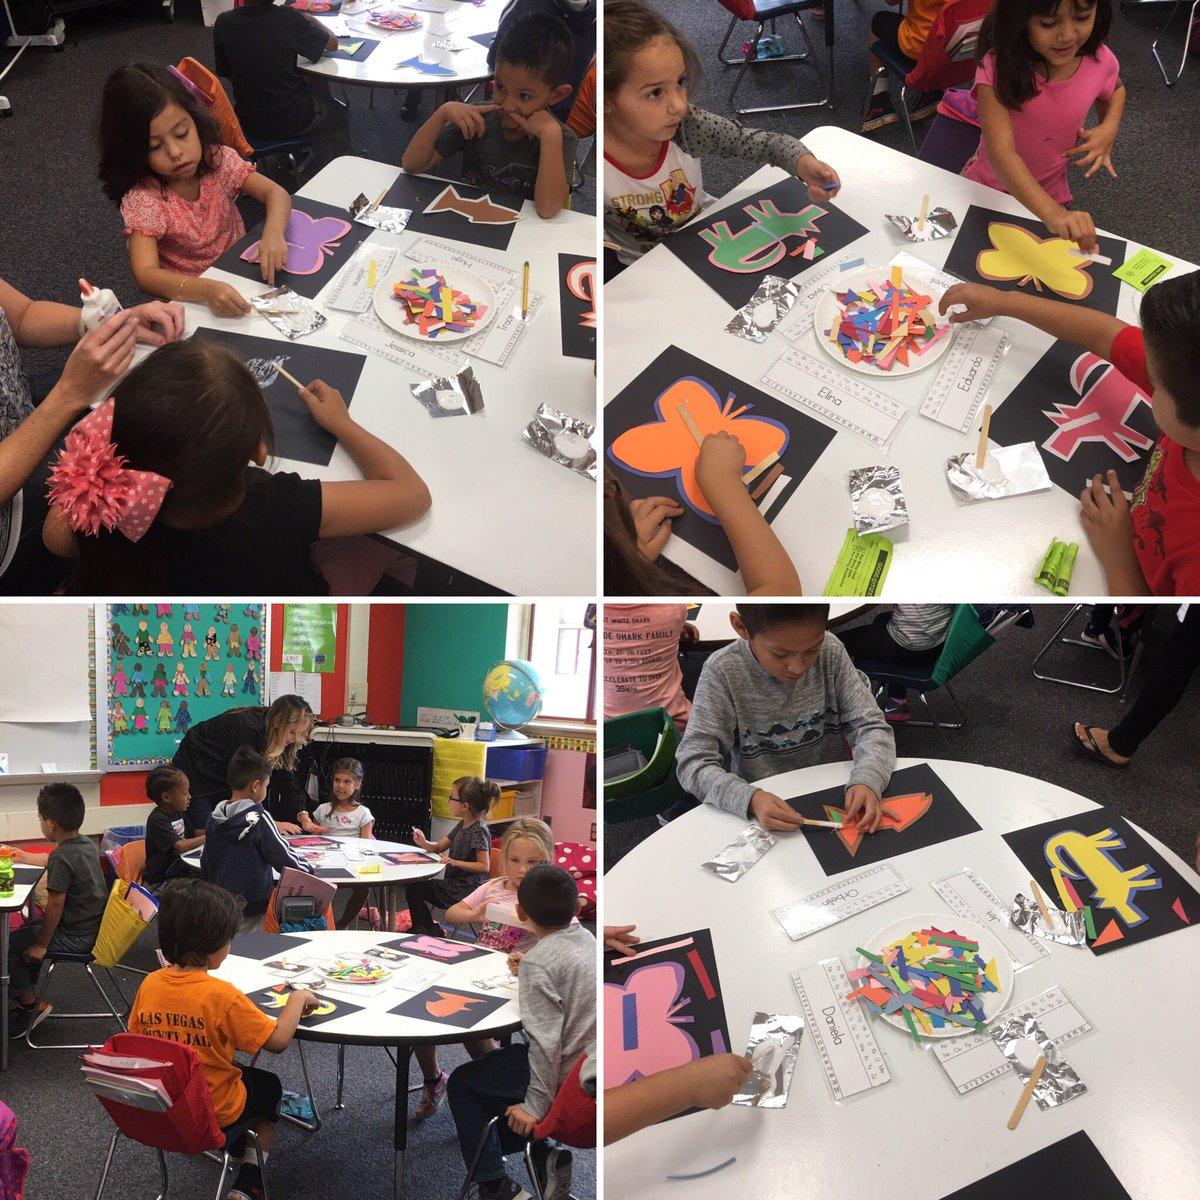 Learning about Panamá  creating #molas @BosLangAcademy thanks  to #volunteers! @CajonValleyUSD @EmbPanama_US<br>http://pic.twitter.com/Dzn1S01YYy &ndash; at Bostonia Elementary